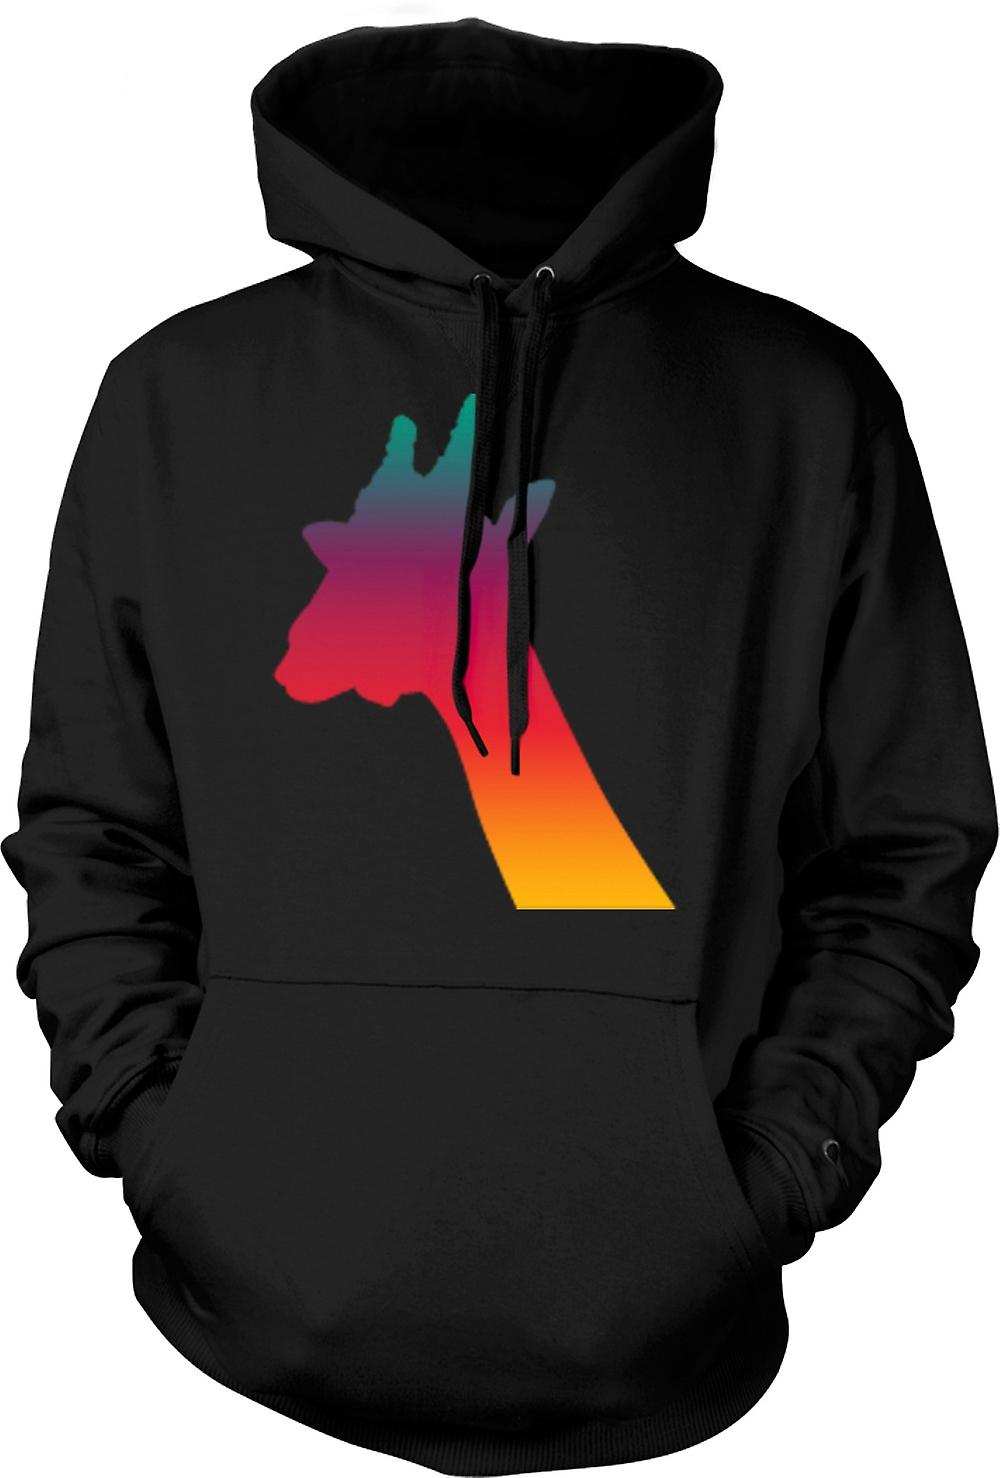 Mens Hoodie - Rainbow Giraffe Psychedelic Design